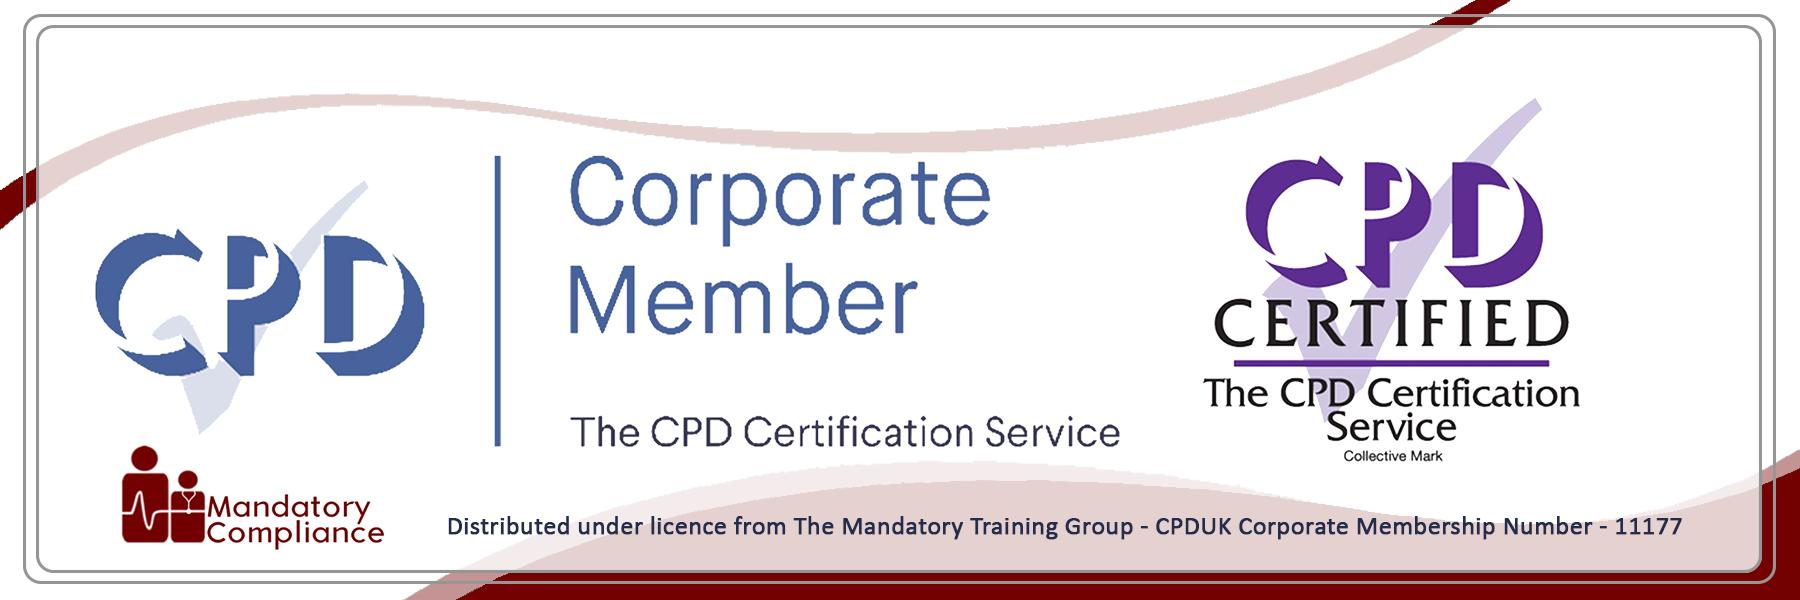 Mandatory Training for Dental Technicians - E-Learning Courses - Mandatory Compliance UK -